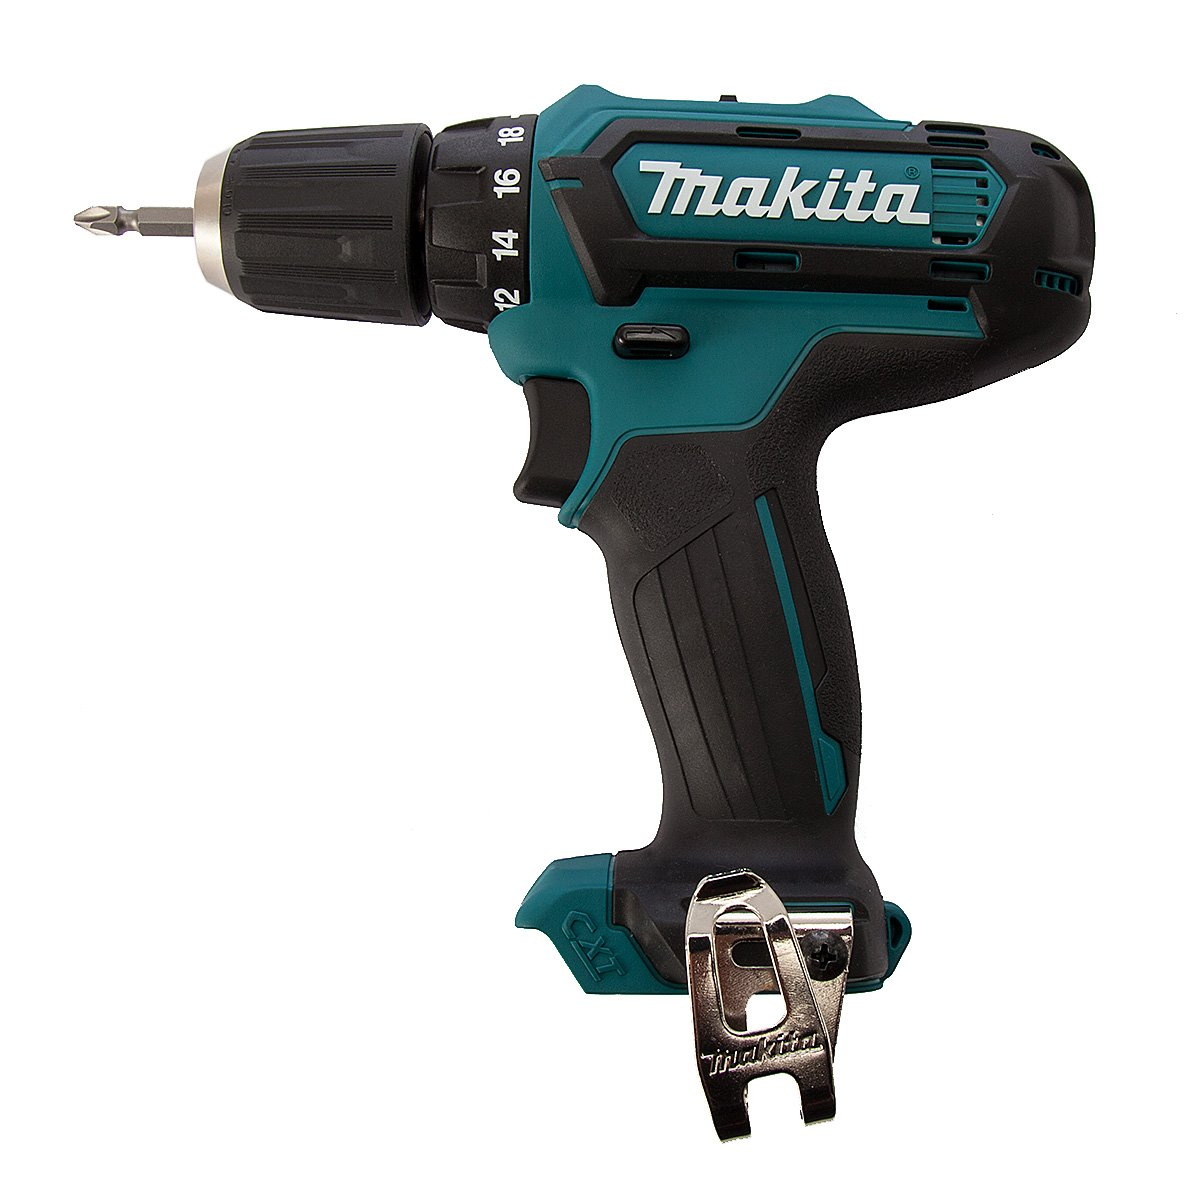 Makita DF331DZ Drill Driver, 10.8 V, Blue, Small